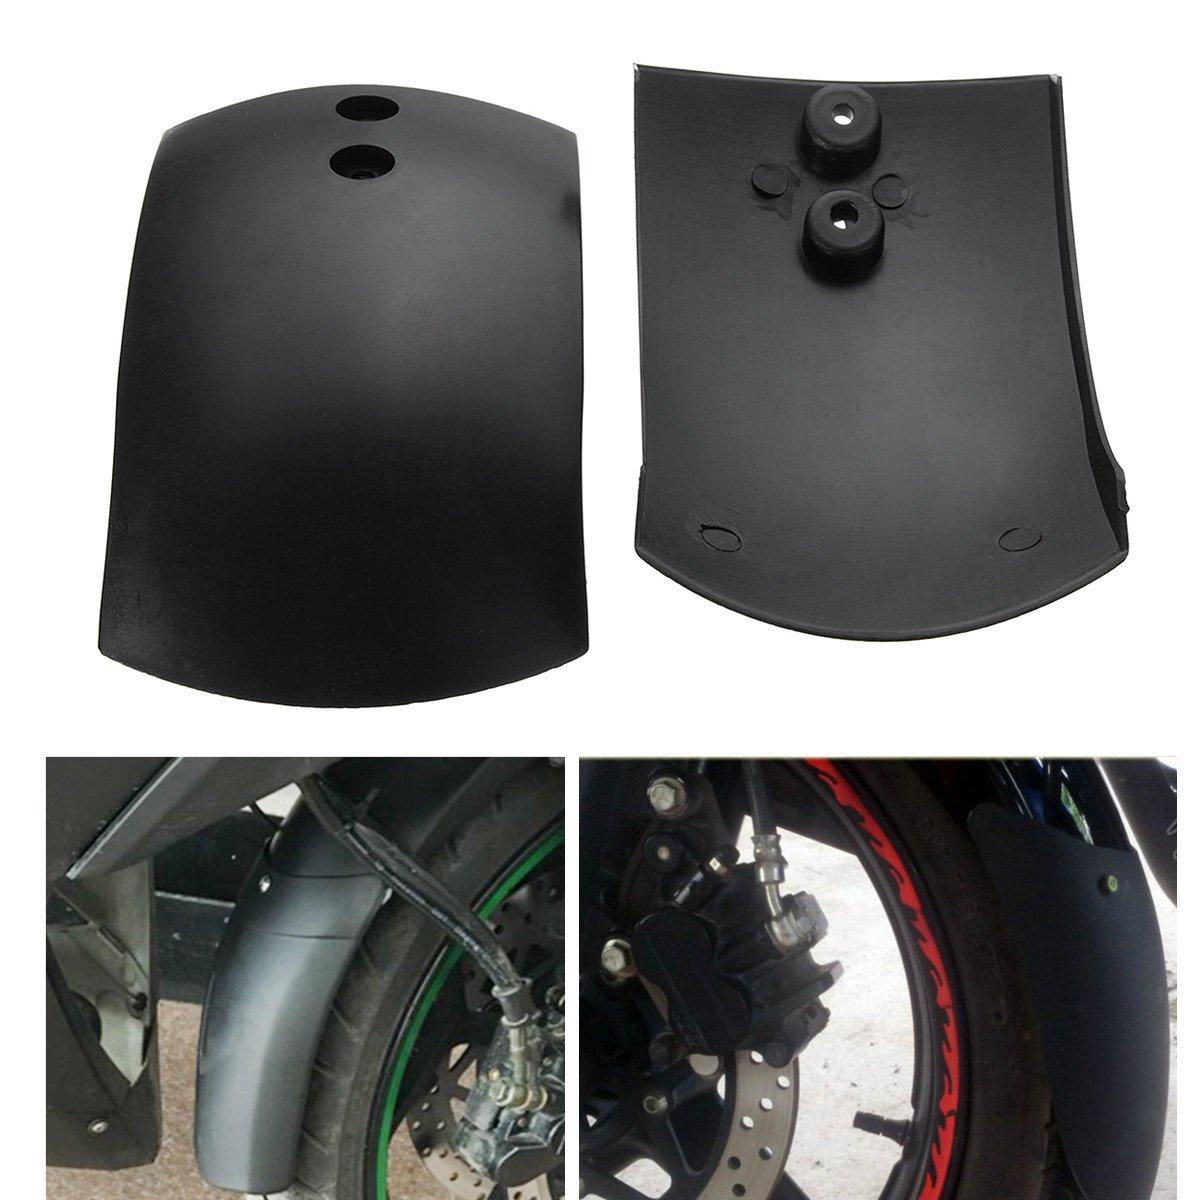 Wooya Front Rear Mud Guards Cover Fender For 43cc 47cc 49cc Mini Quad Dirt Bike ATV